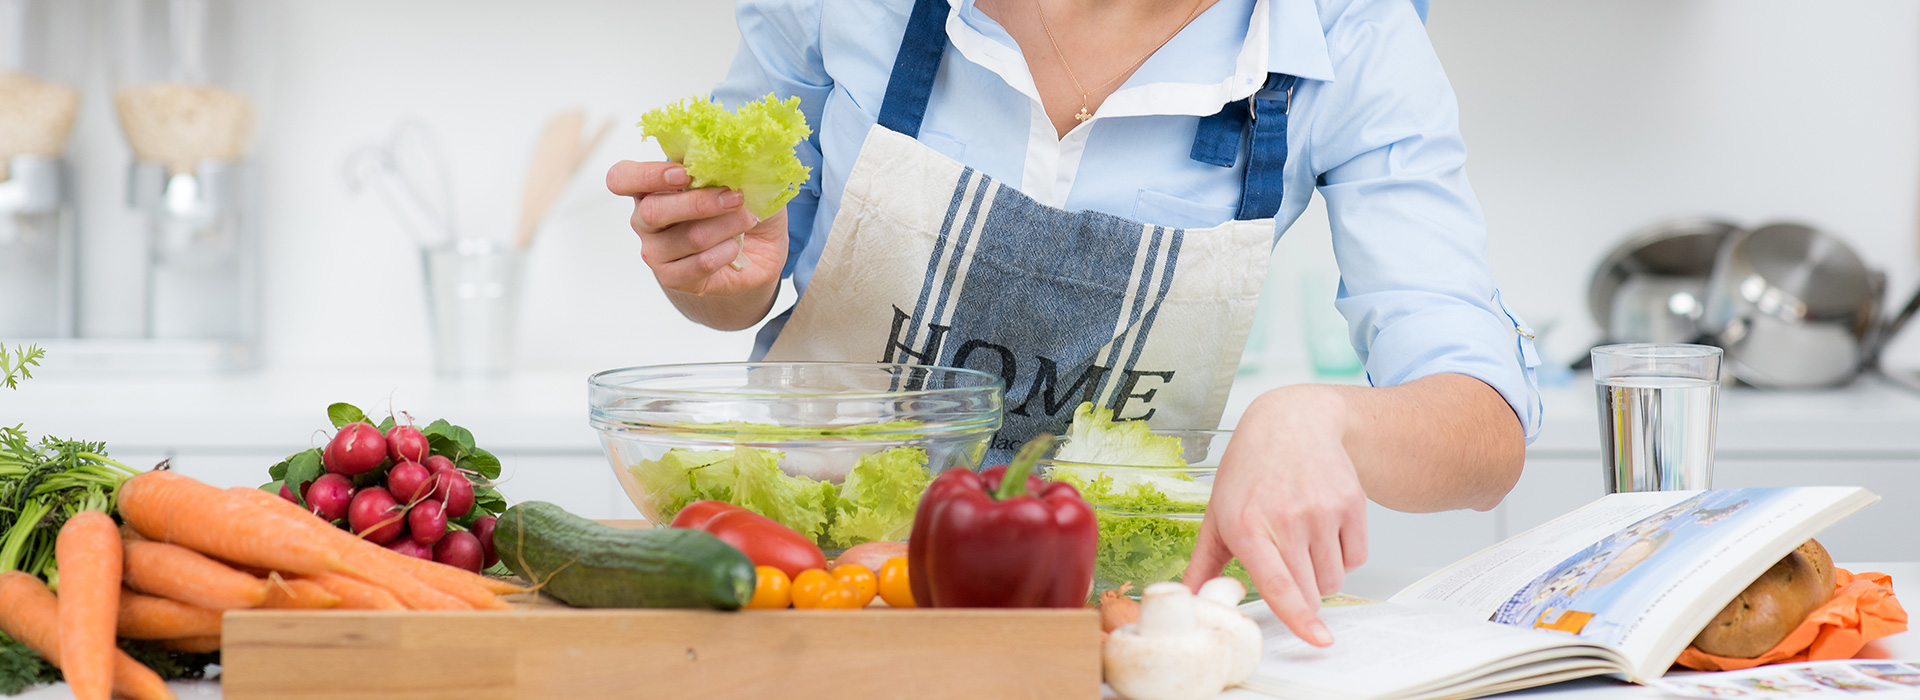 slider 2 my-cuisine